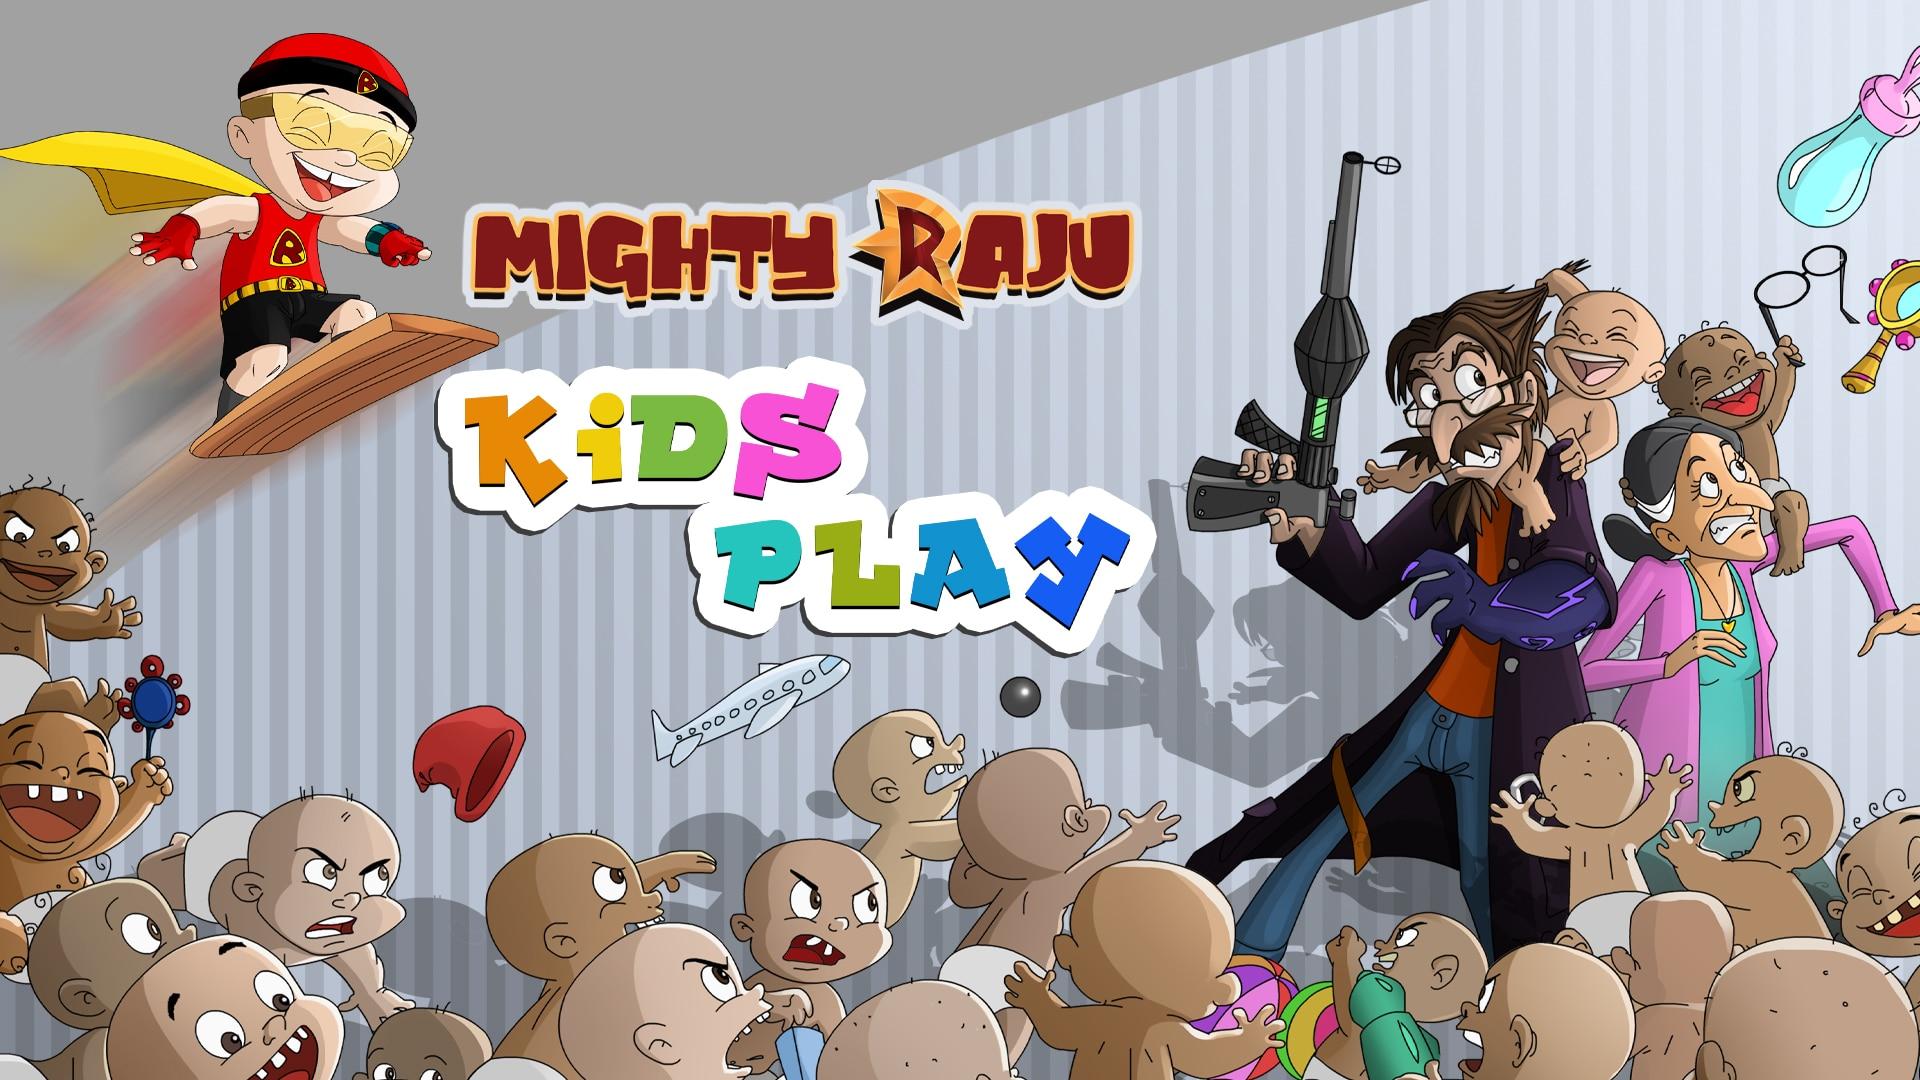 Mighty Raju Kids Play Full Movie In Telugu